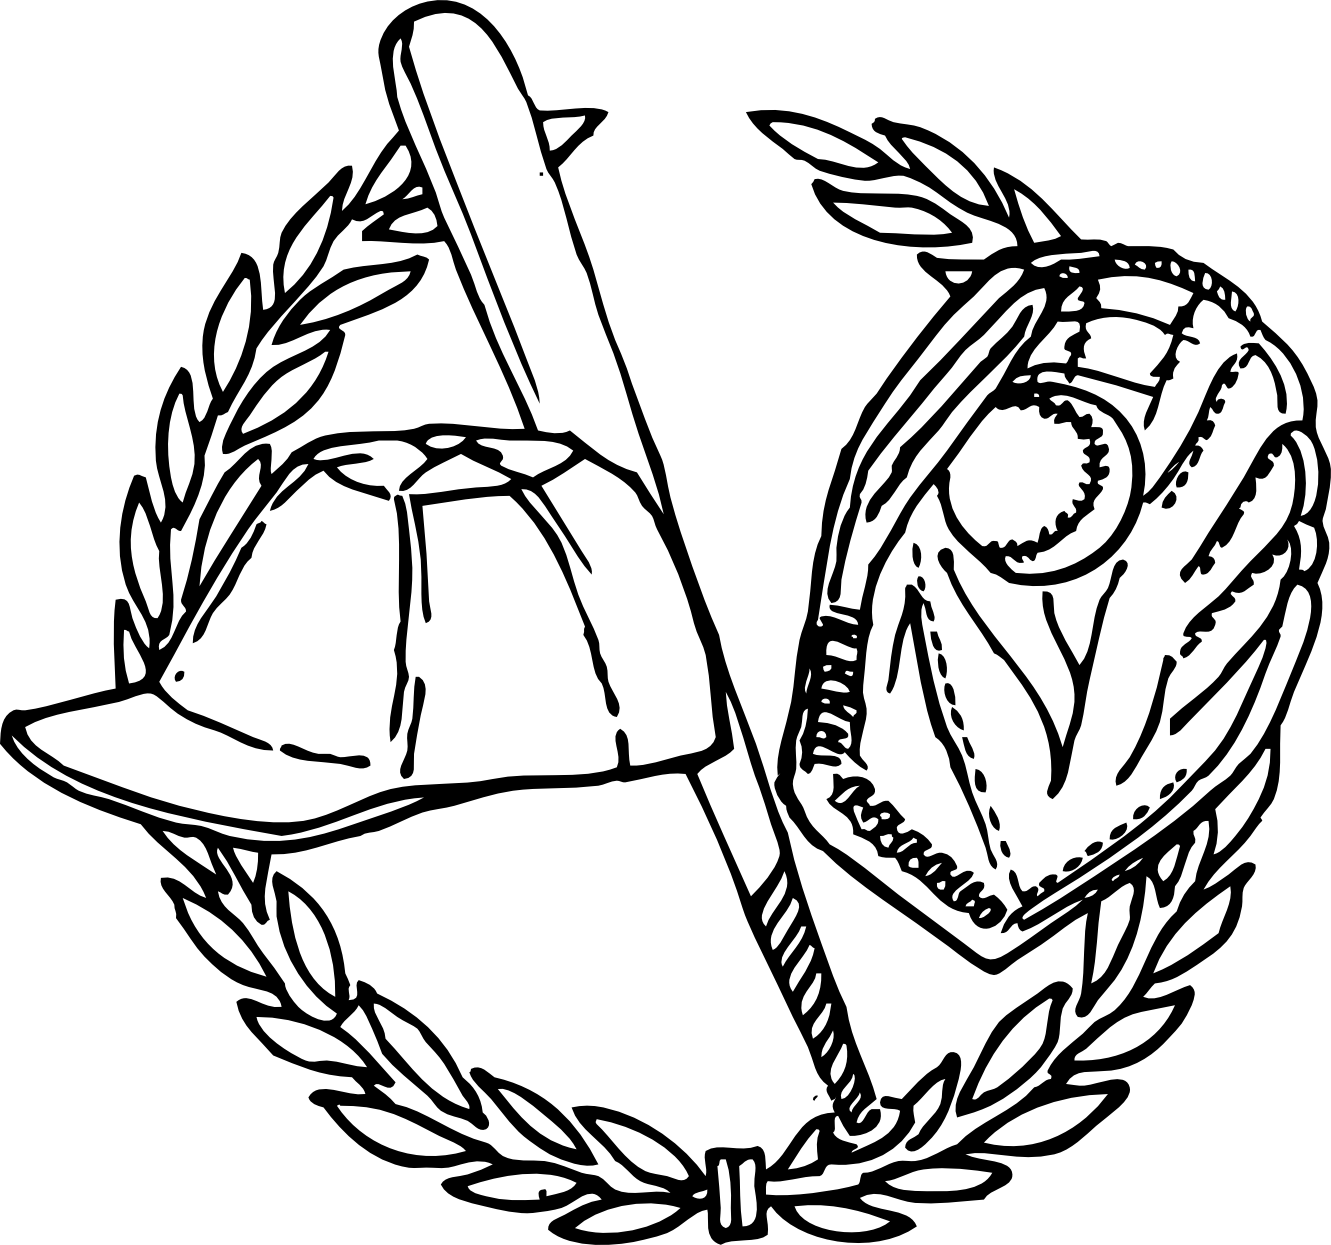 Baseball Clipart Black And White-baseball clipart black and white-13